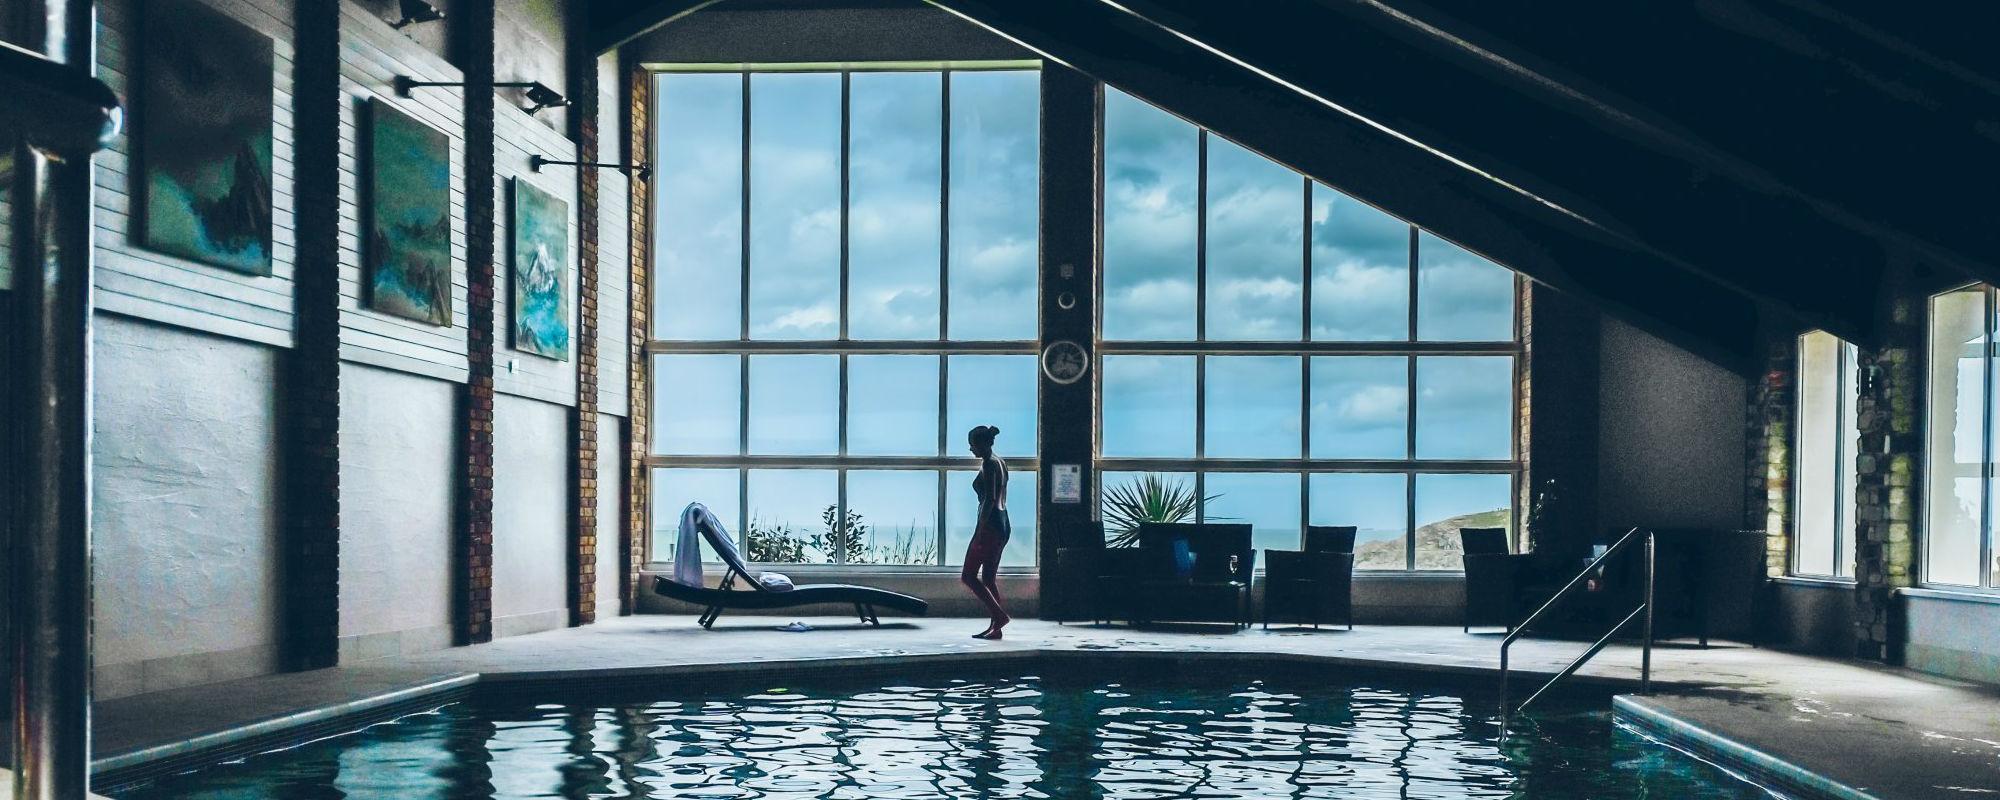 Pool - Crantock Bay Spa